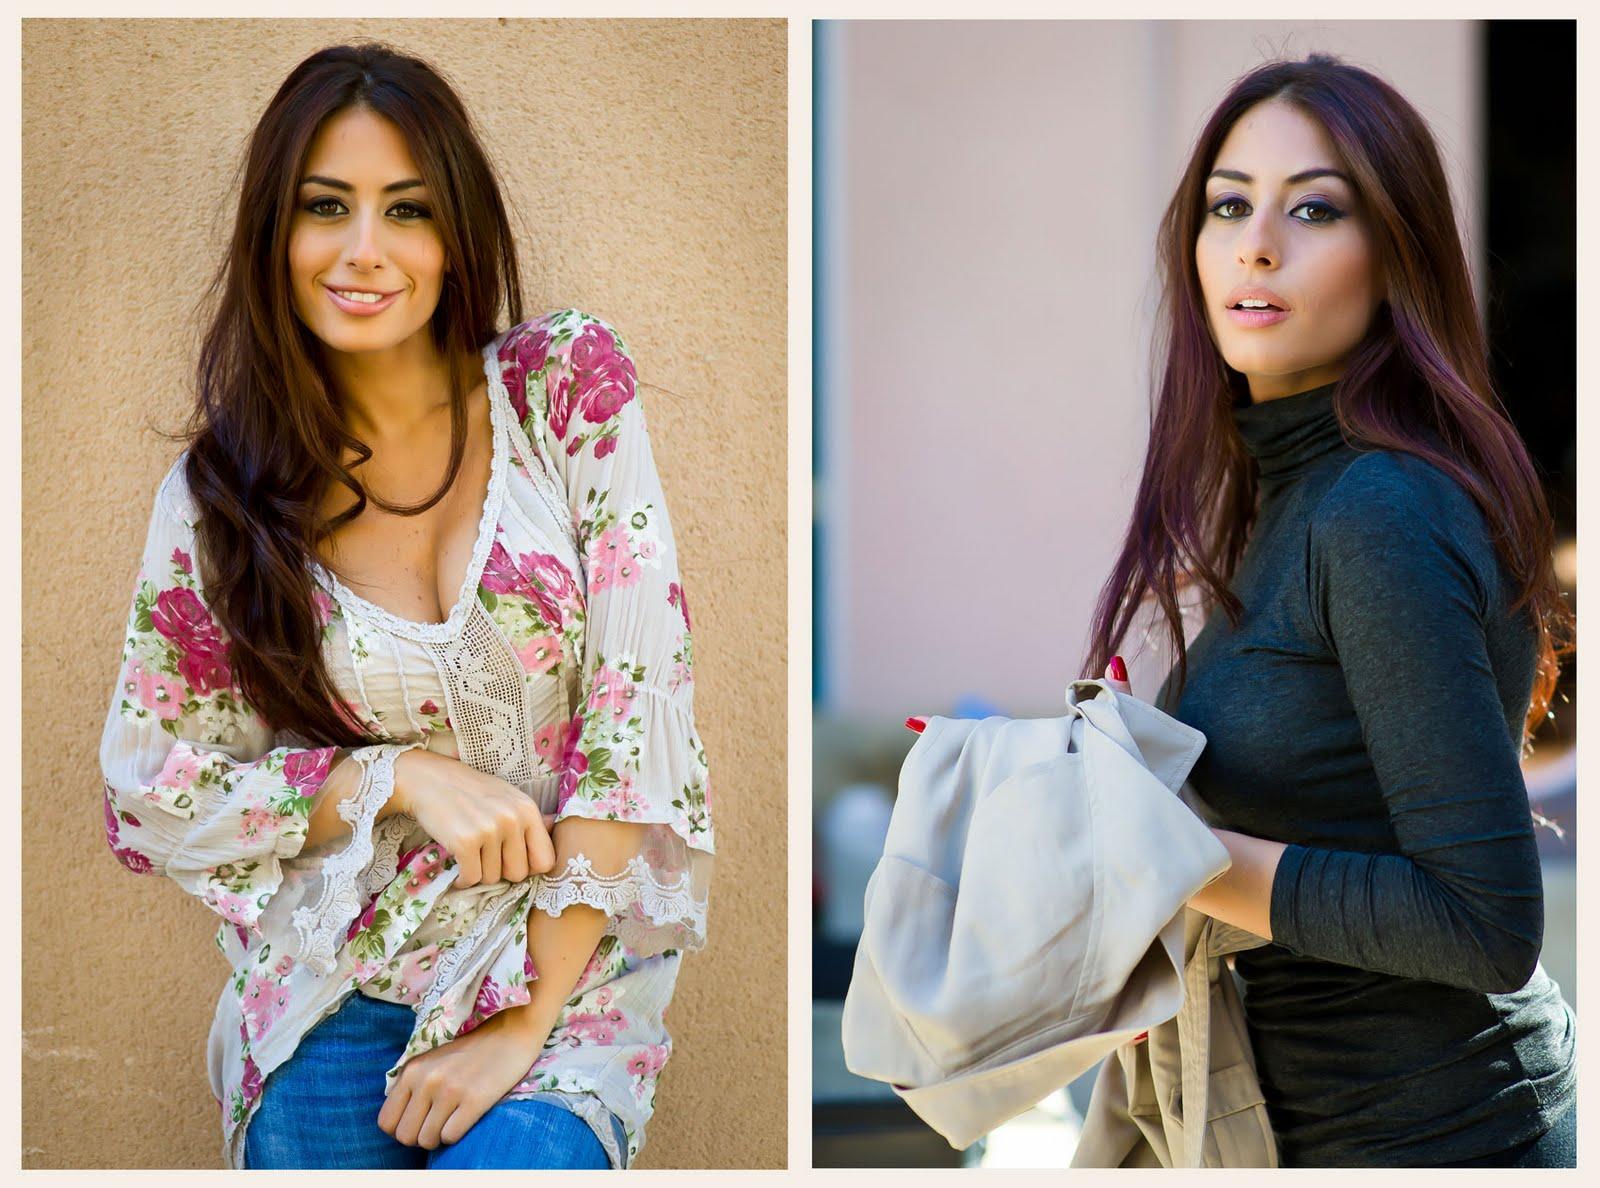 oussama rahbani and hiba tawaji relationship test